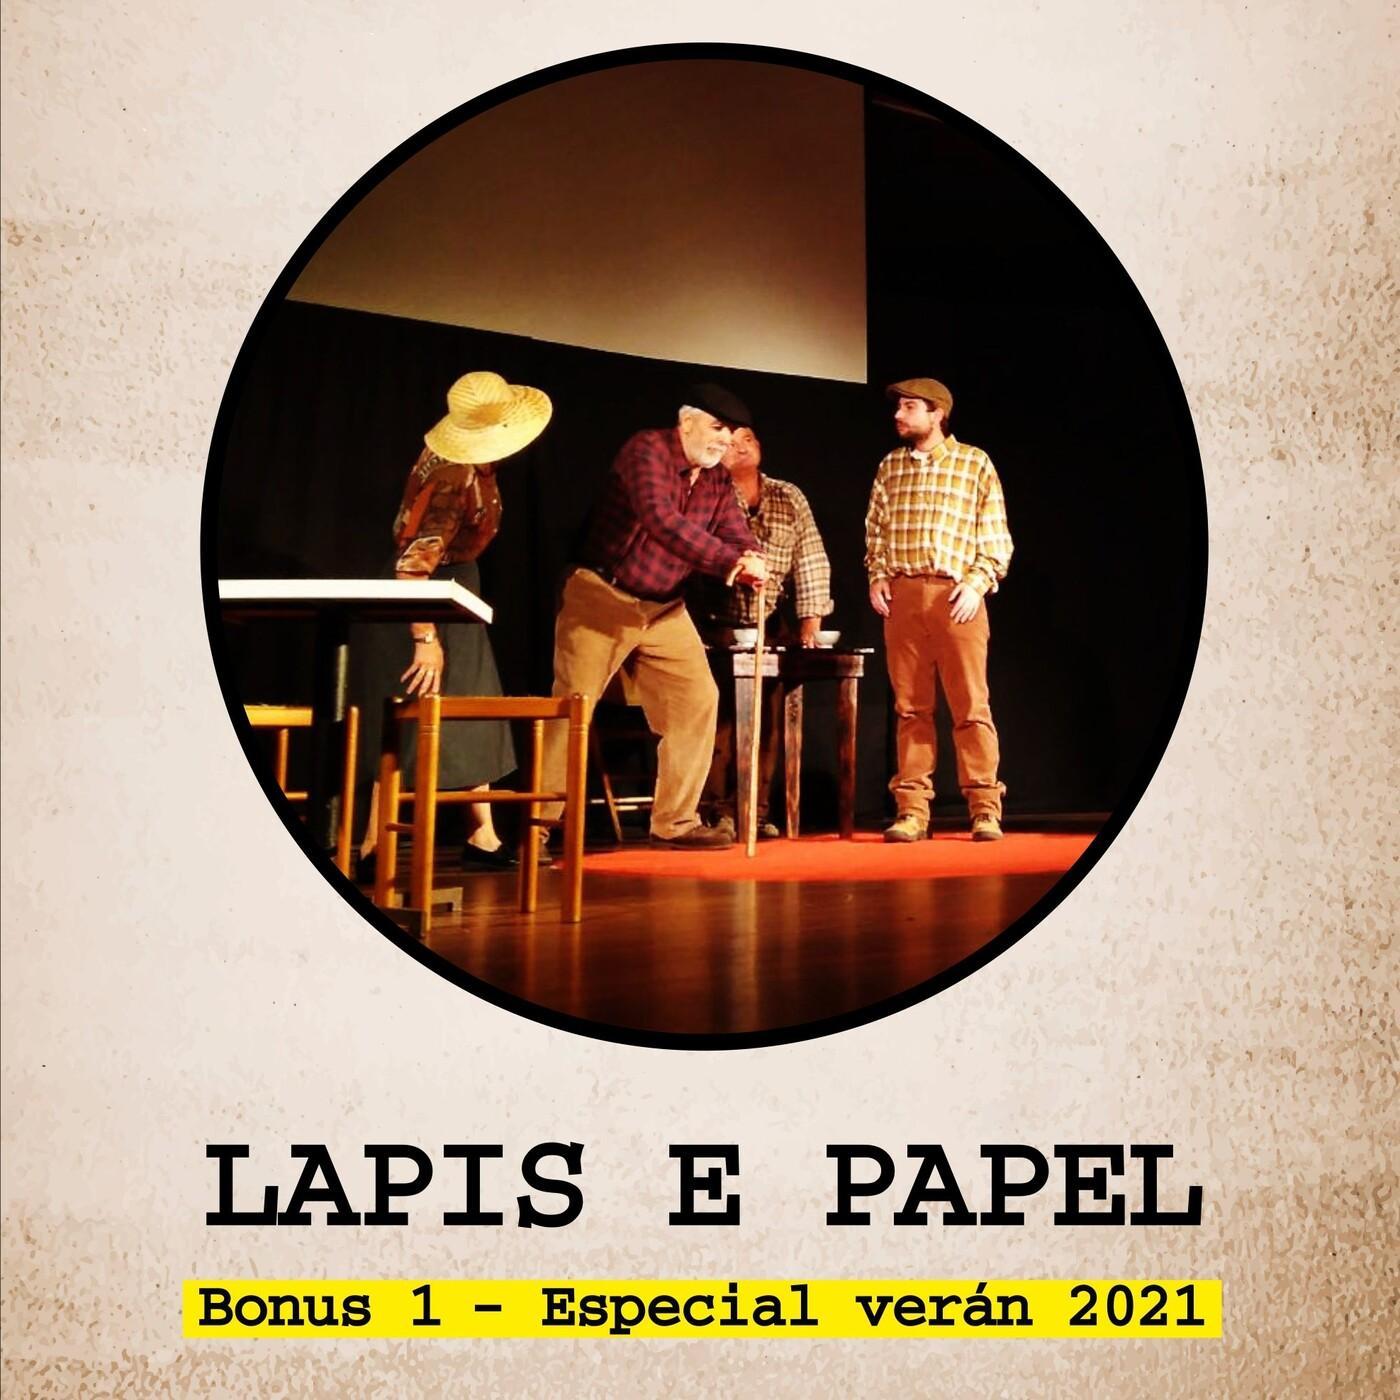 Lapis e papel – Bonus 1 – Especial verán 2021